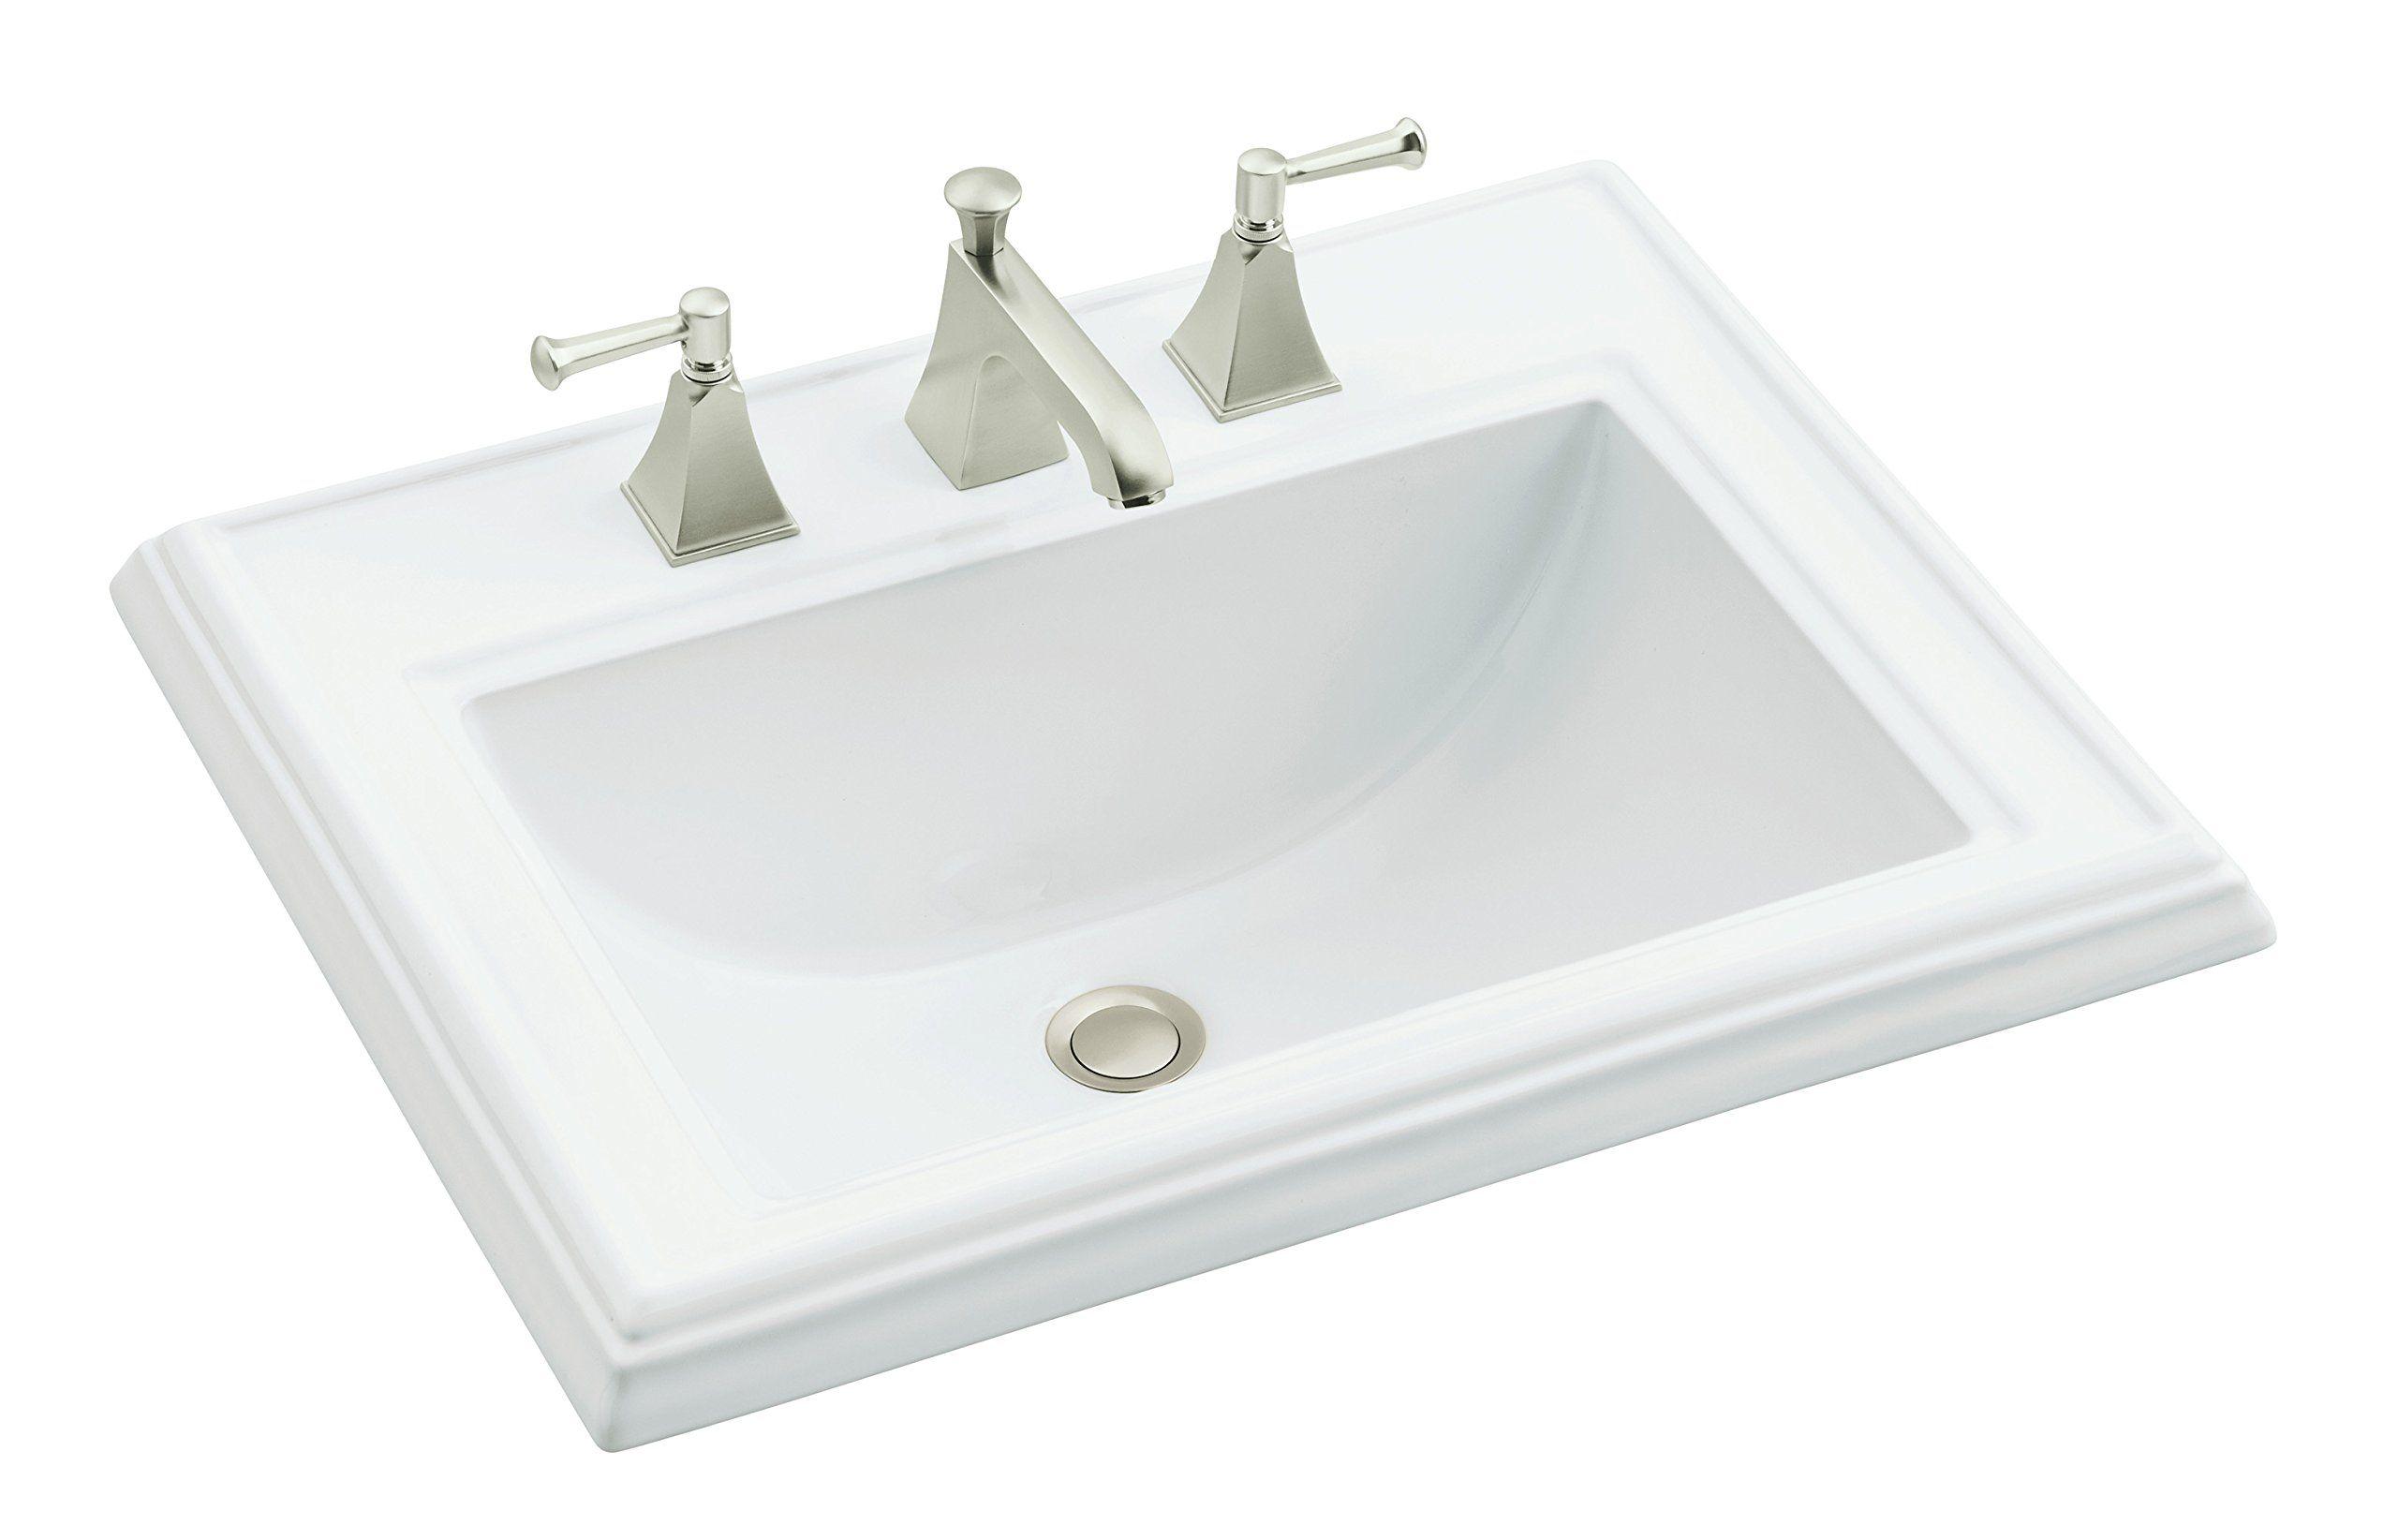 Kohler K224180 Memoirs Classic Dropin Bathroom Sink White Visit